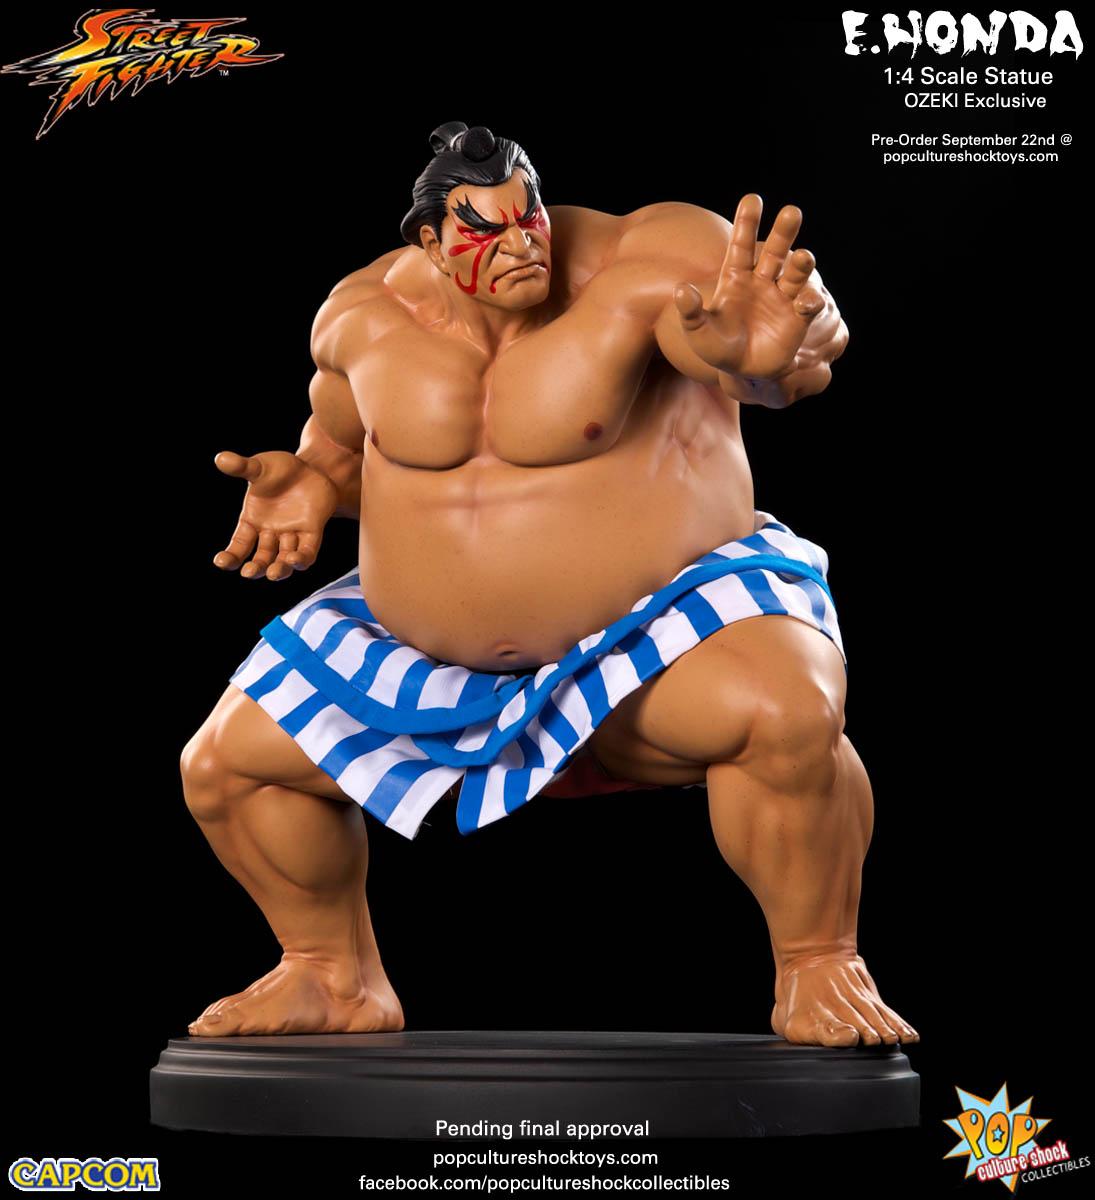 [Pop Culture Shock] Street Fighter: E. Honda 1/4 Statue - Página 3 Street-Fighter-E.-Honda-ozeki-Statue-004